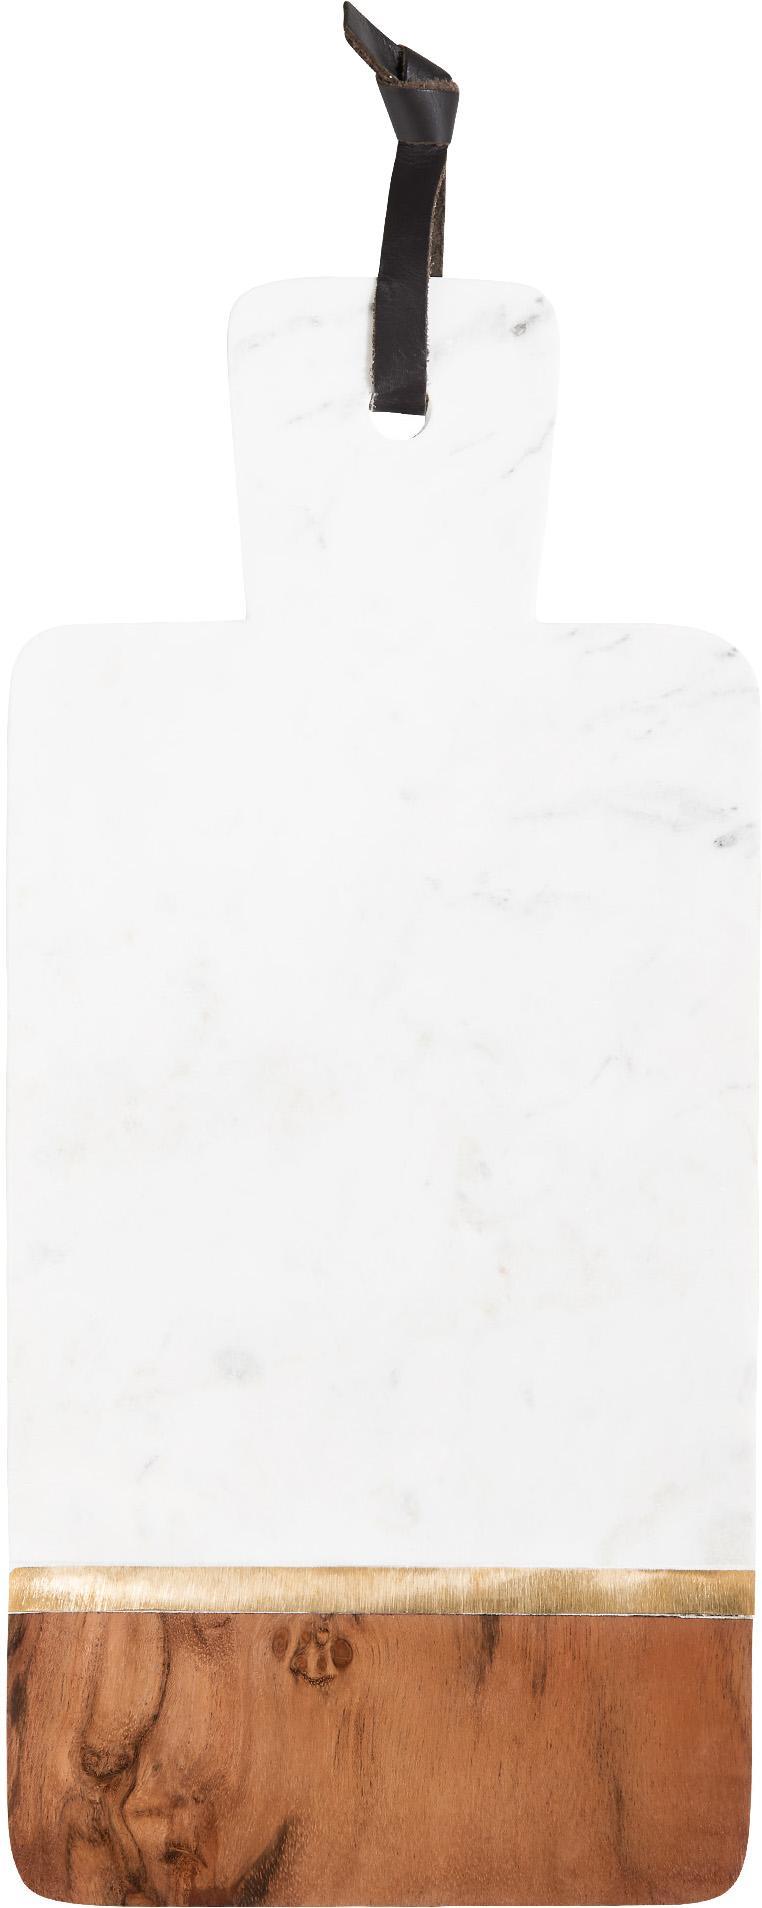 Marmor-Schneidebrett Luxory Kitchen, Marmor, Akazienholz, Messing, Weiß, Akazienholz, Messing, 17 x 37 cm